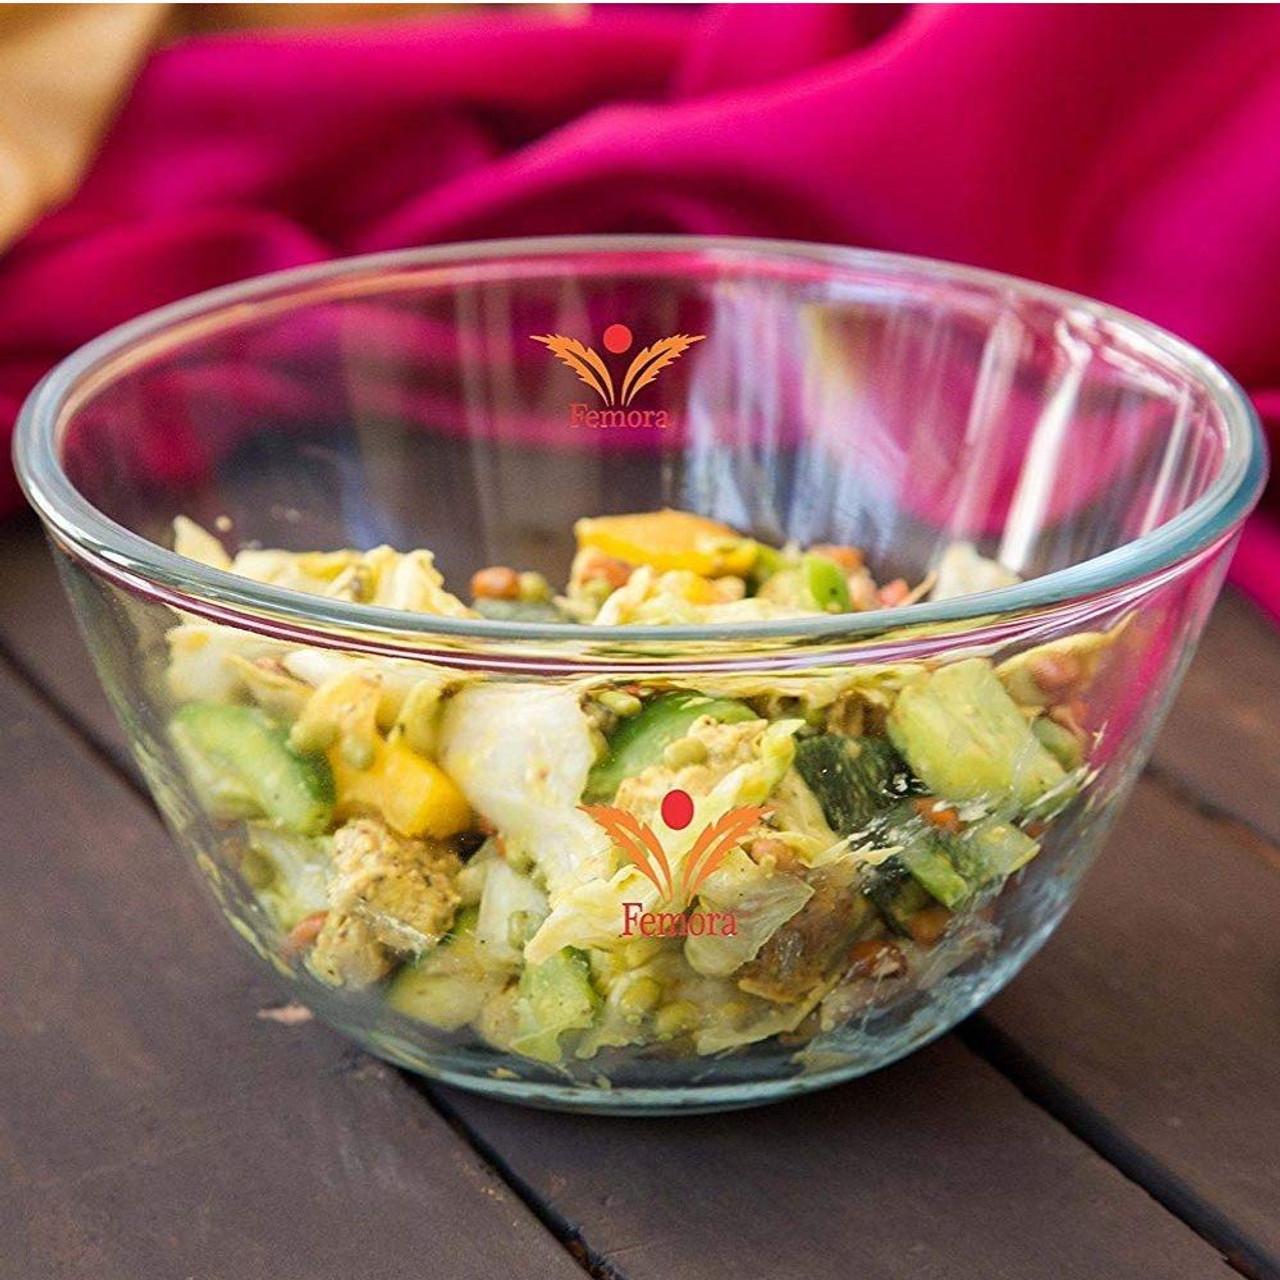 femora borosilicate glass microwave safe mixing bowl 3600 ml